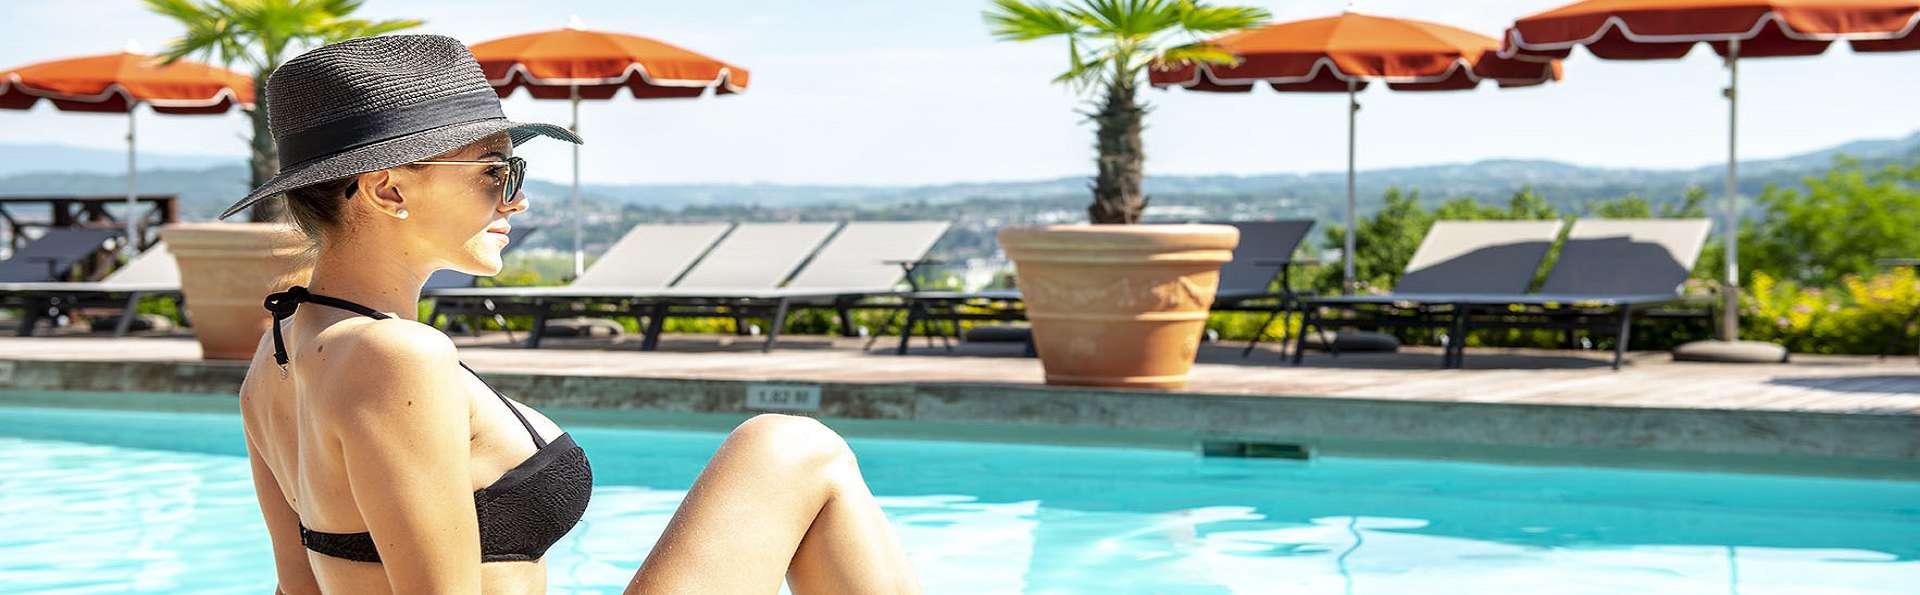 Hôtel les Trésoms Lake and Spa Resort - Annecy - Vauban-Tresoms-mai2019-031.jpg